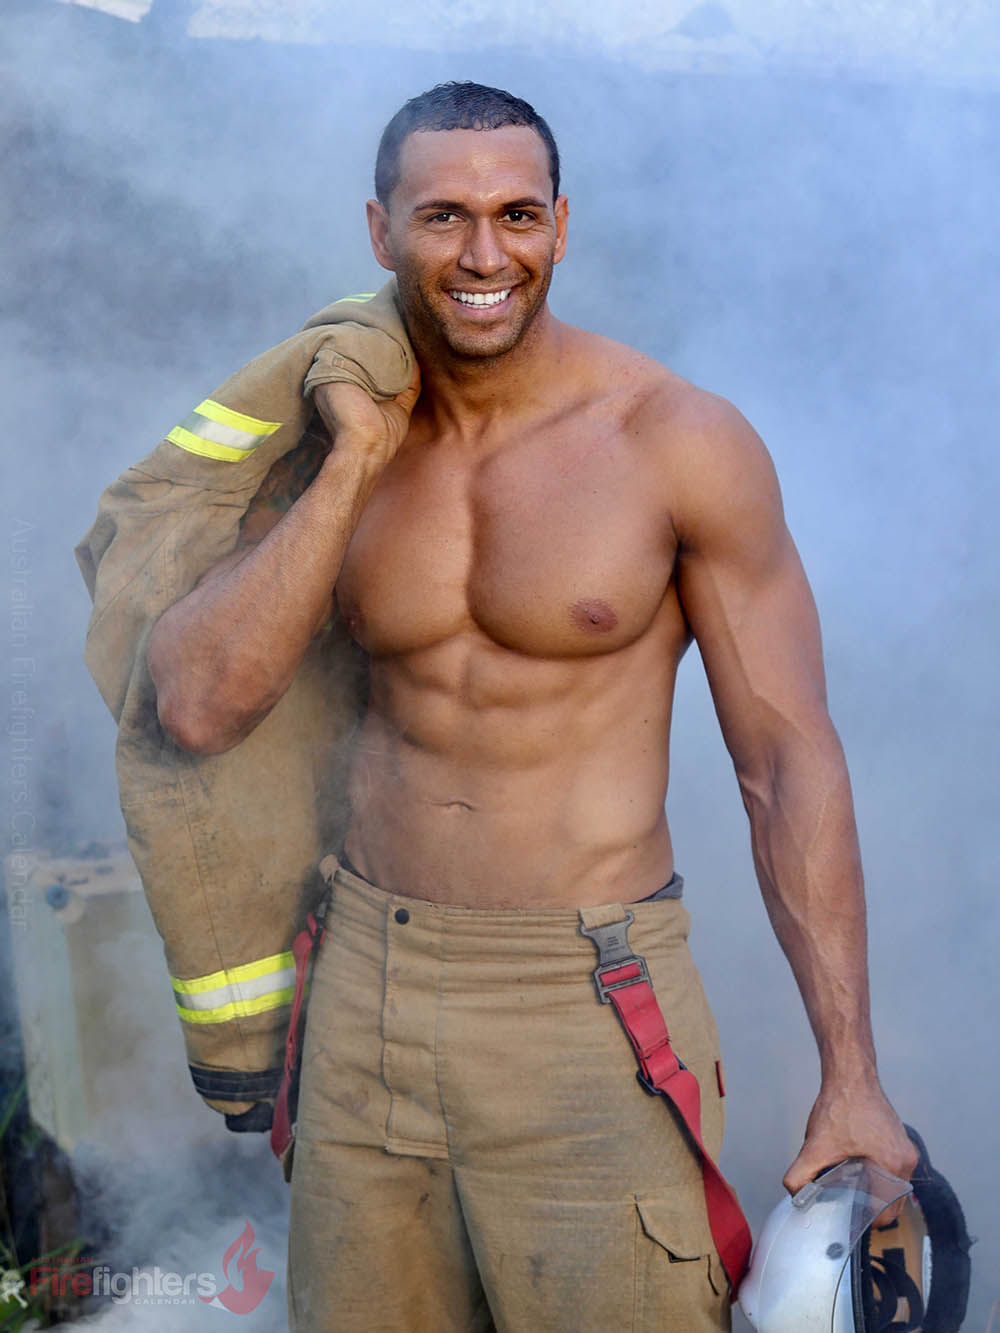 bomberos australianos calendario 2019 - 20